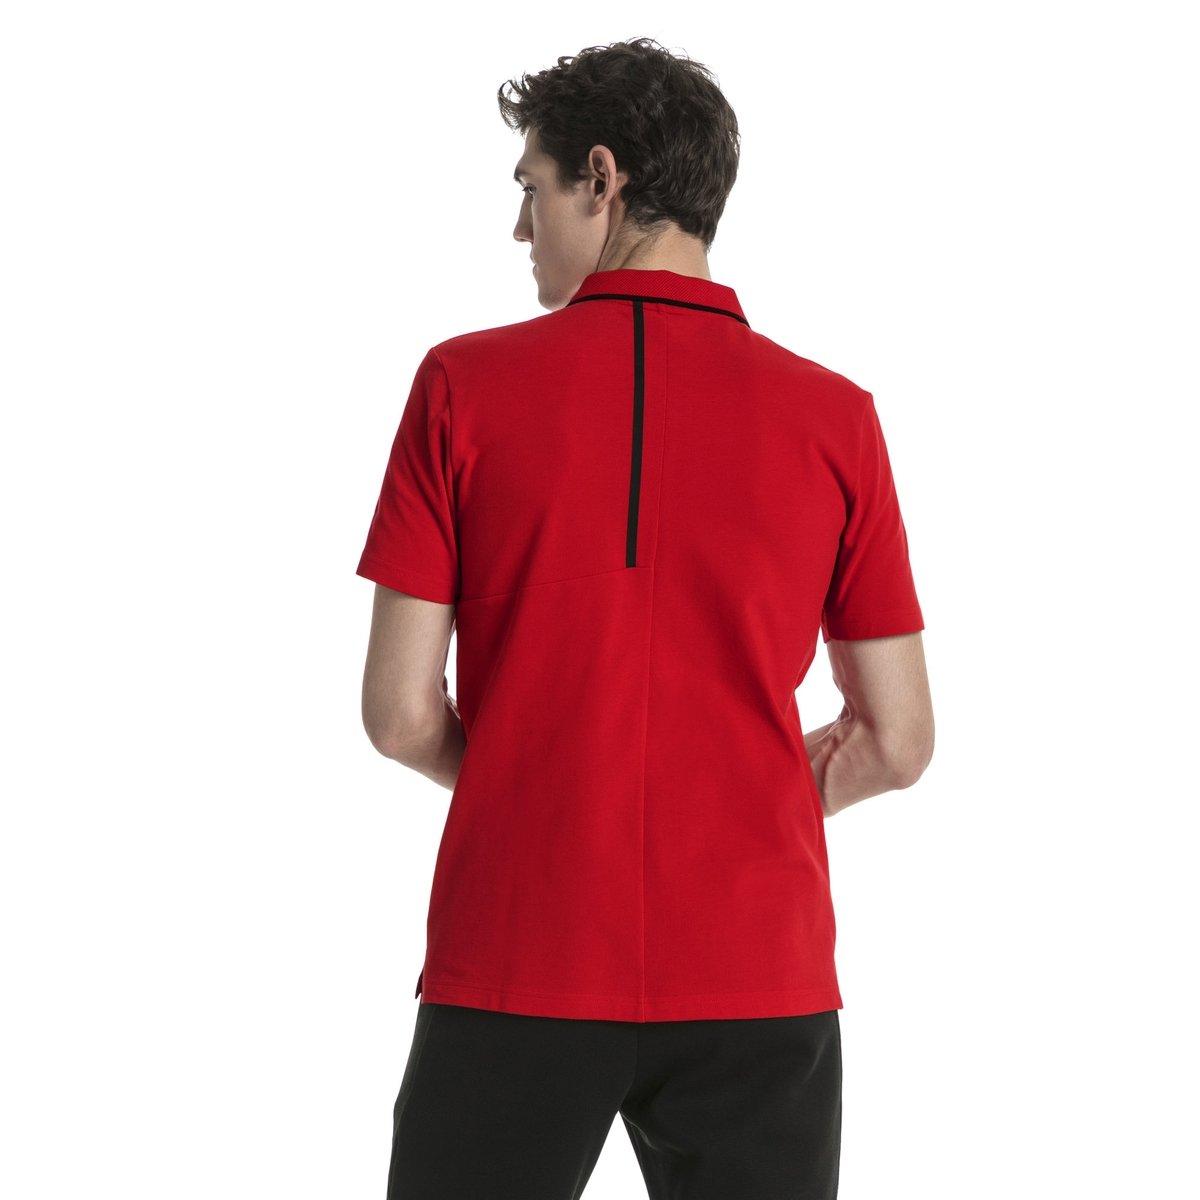 4fdb7aafbd3ba Camisa Polo Puma Scuderia Ferrari - Compre Agora